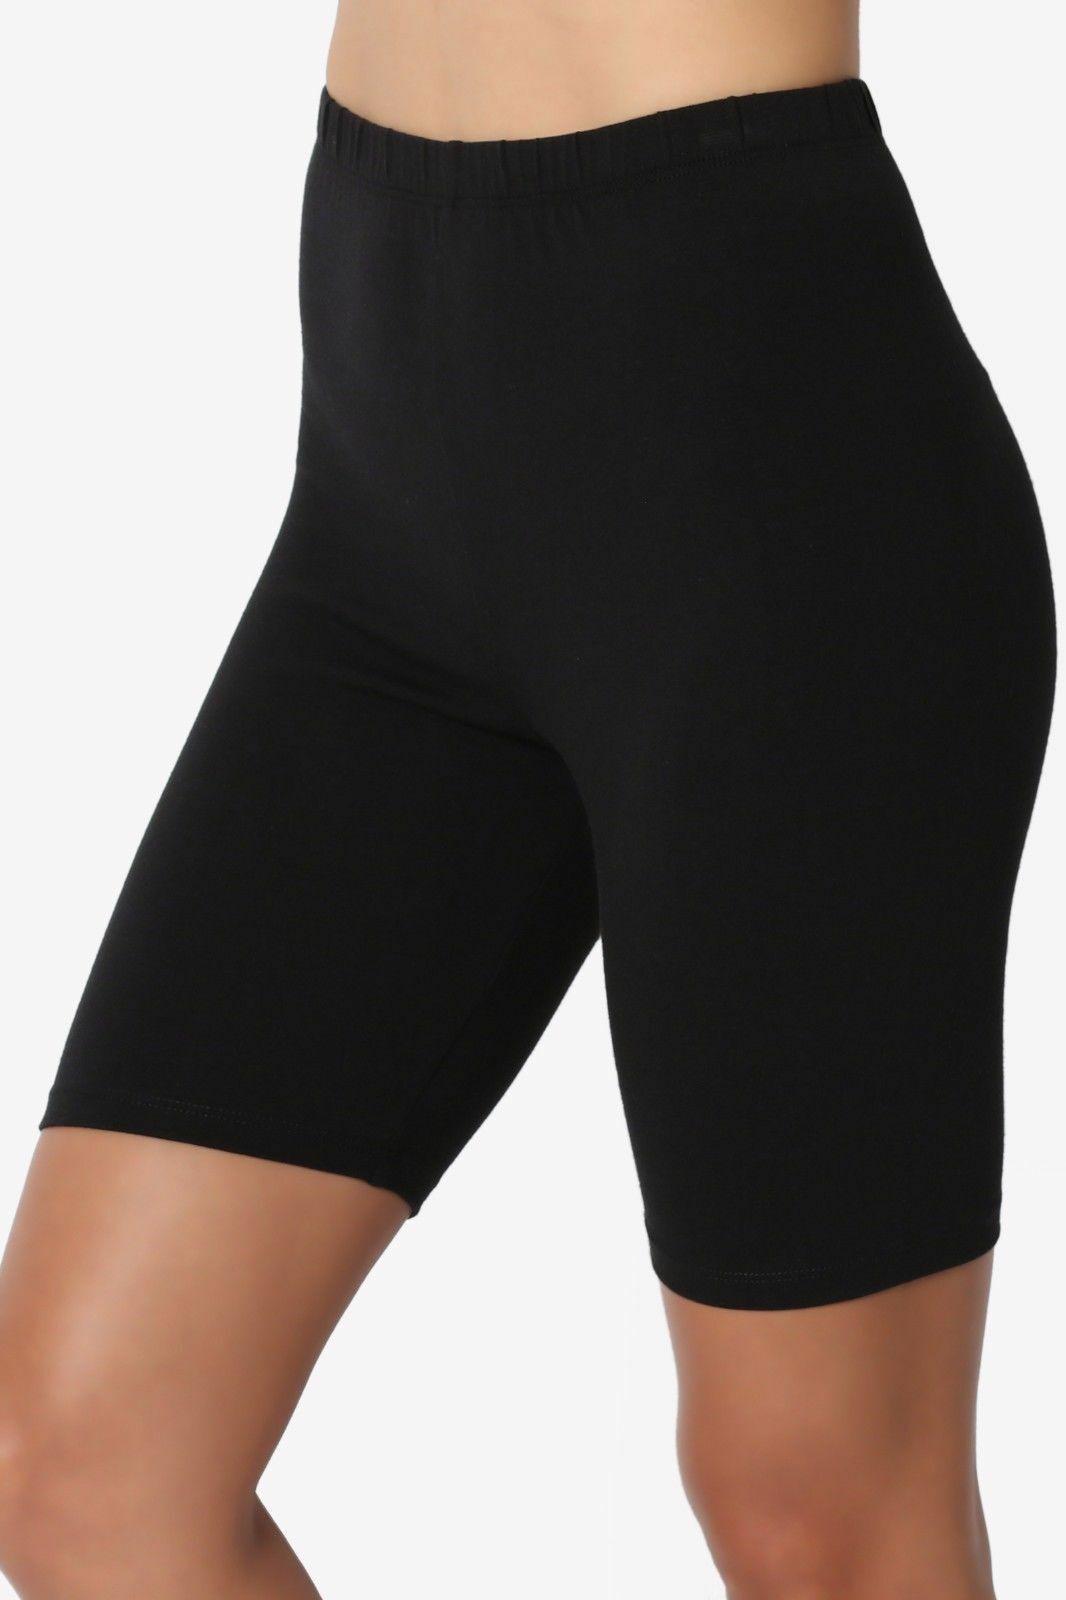 Crazy Chick Women Black Microfibre Cycling Shorts